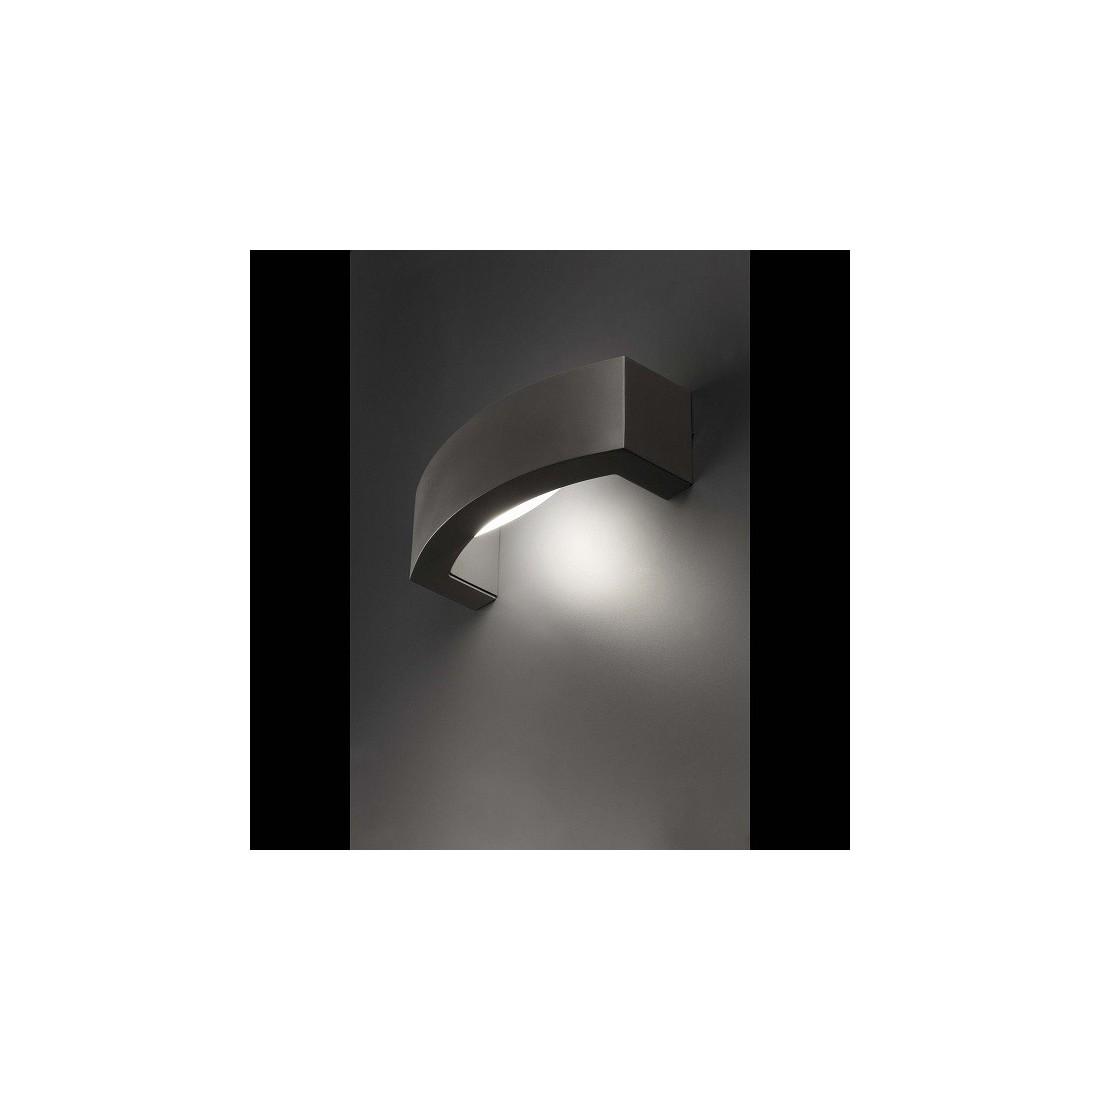 Iluminacion Baño Ofertas:iluminacion baño, como iluminar baño, iluminacion espejo baño